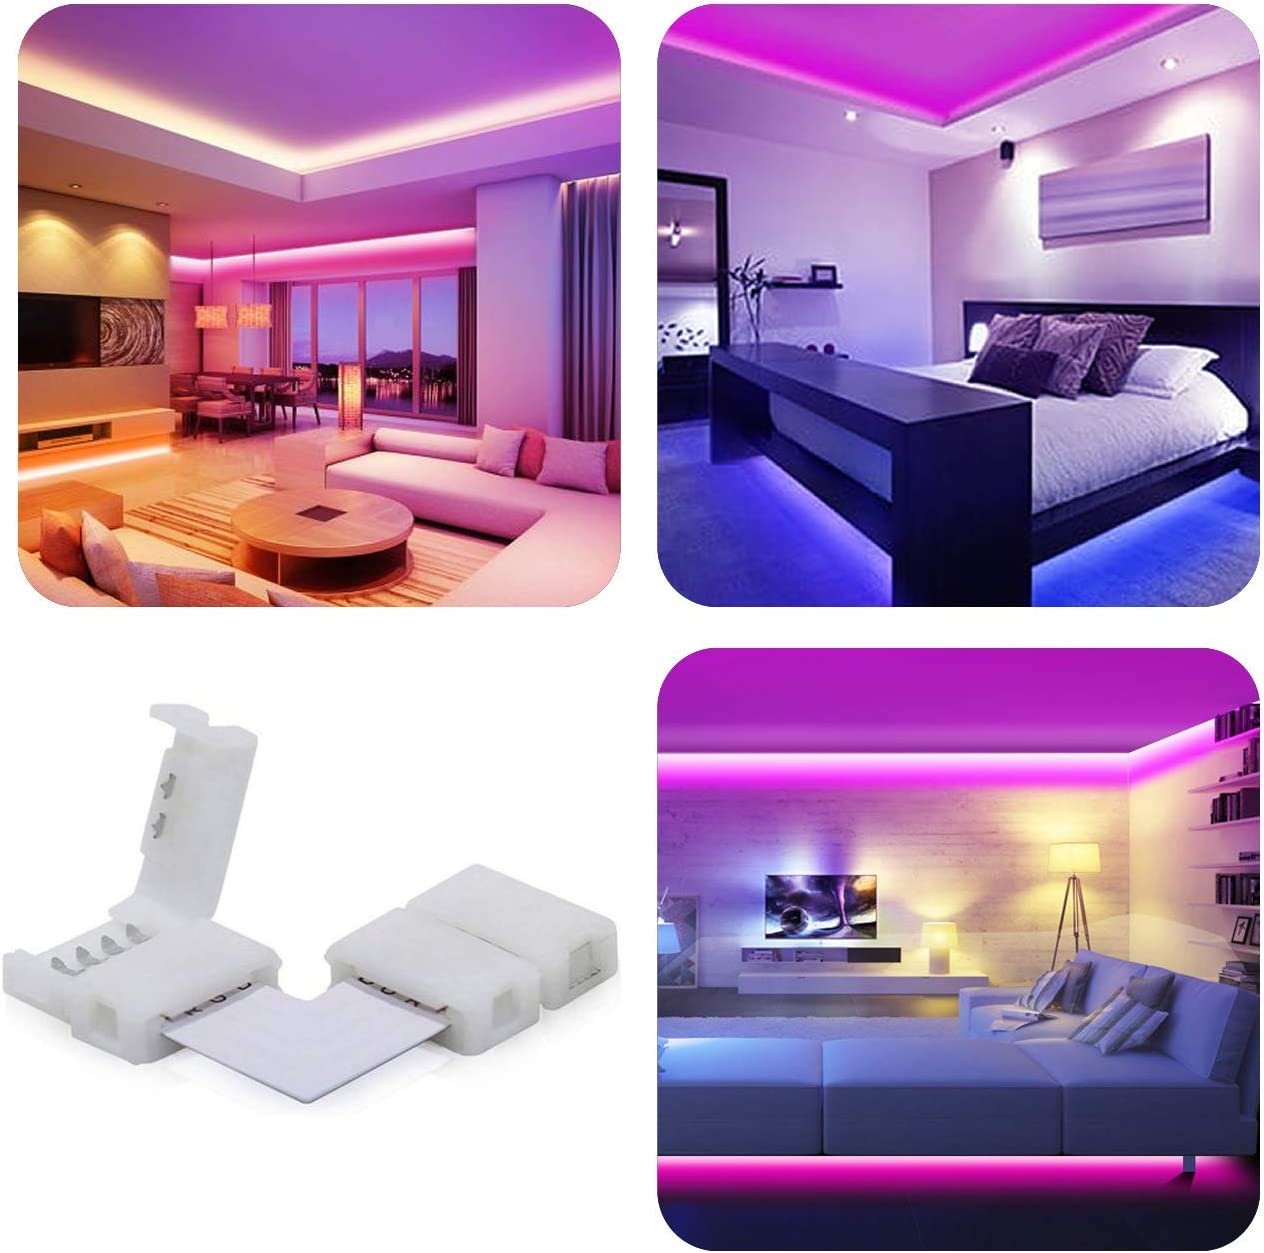 5050 4-Pin RGB Strip Light Solderless 90 Degree Corner Connector for LED Strip Lights L-Shape LED Connector 20pc